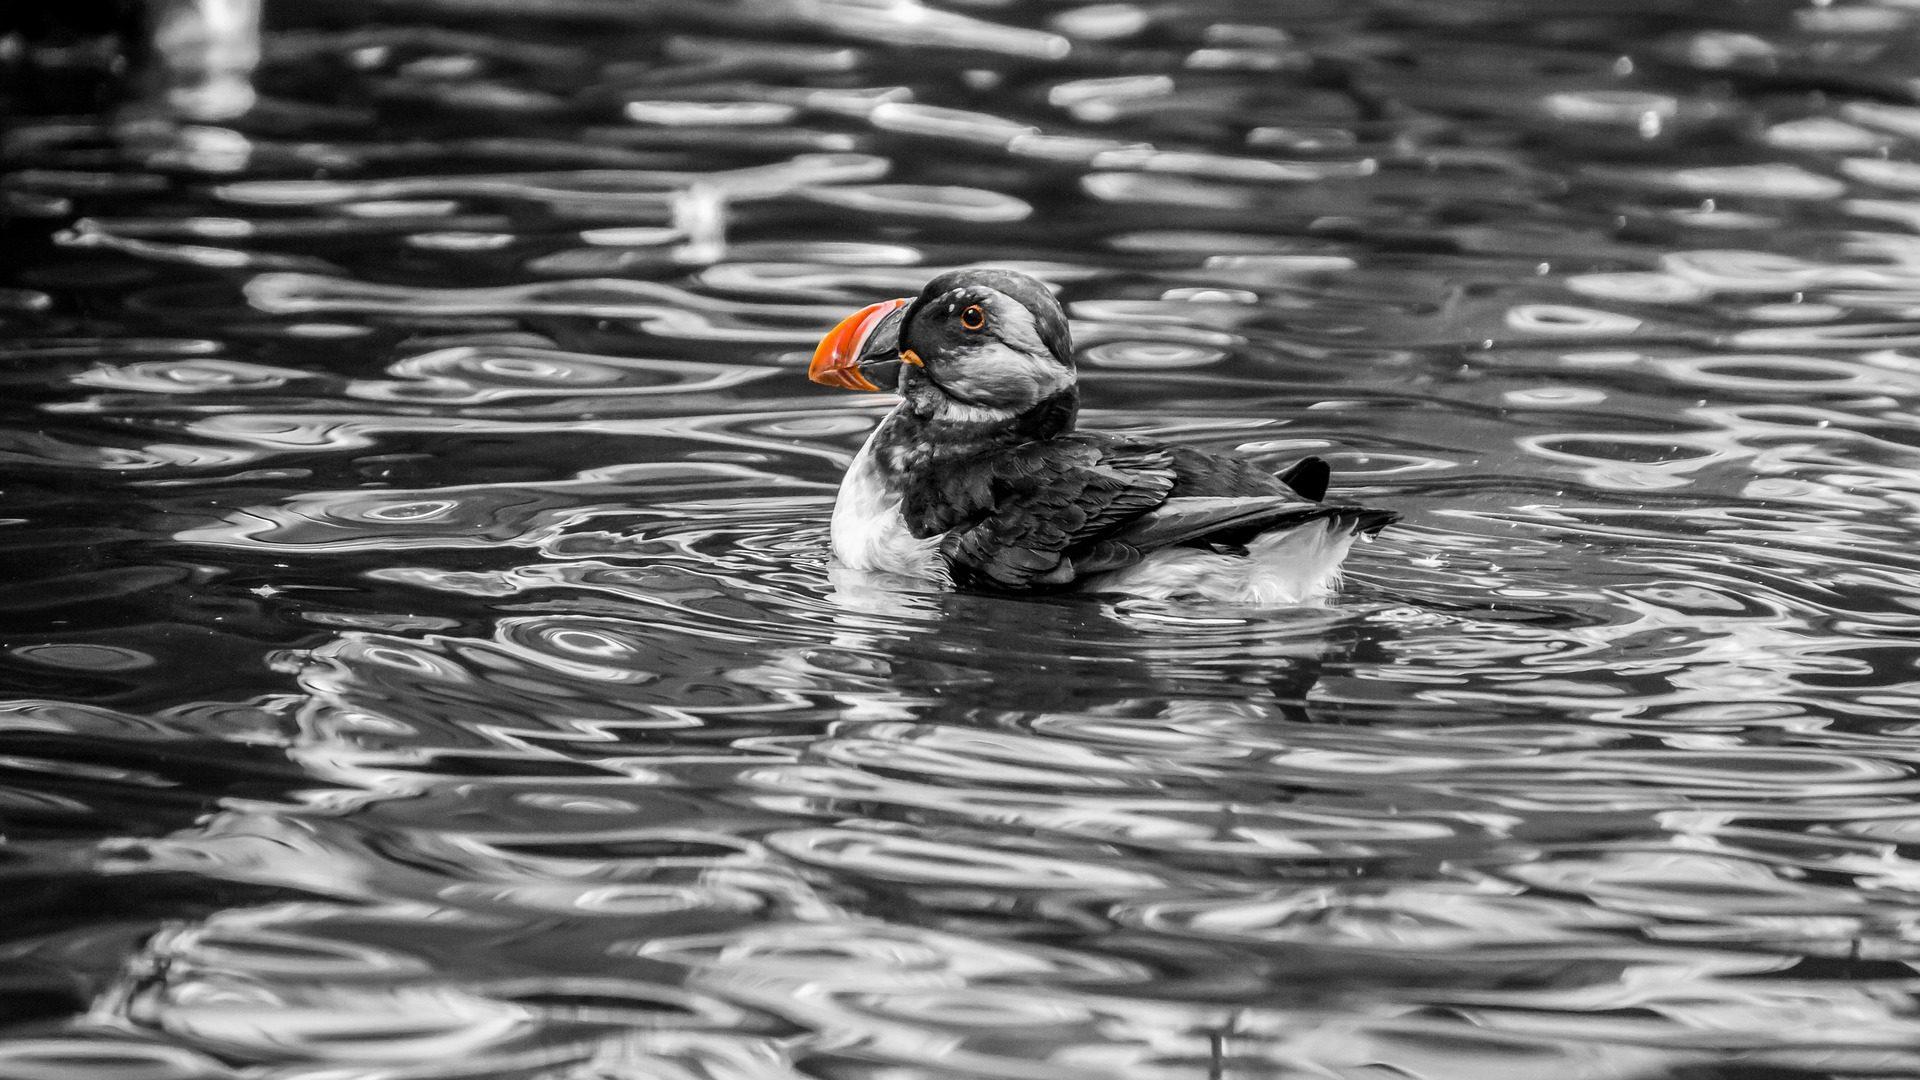 pinguino, frailecillo, agua, nadar, pico, naranja - Fondos de Pantalla HD - professor-falken.com